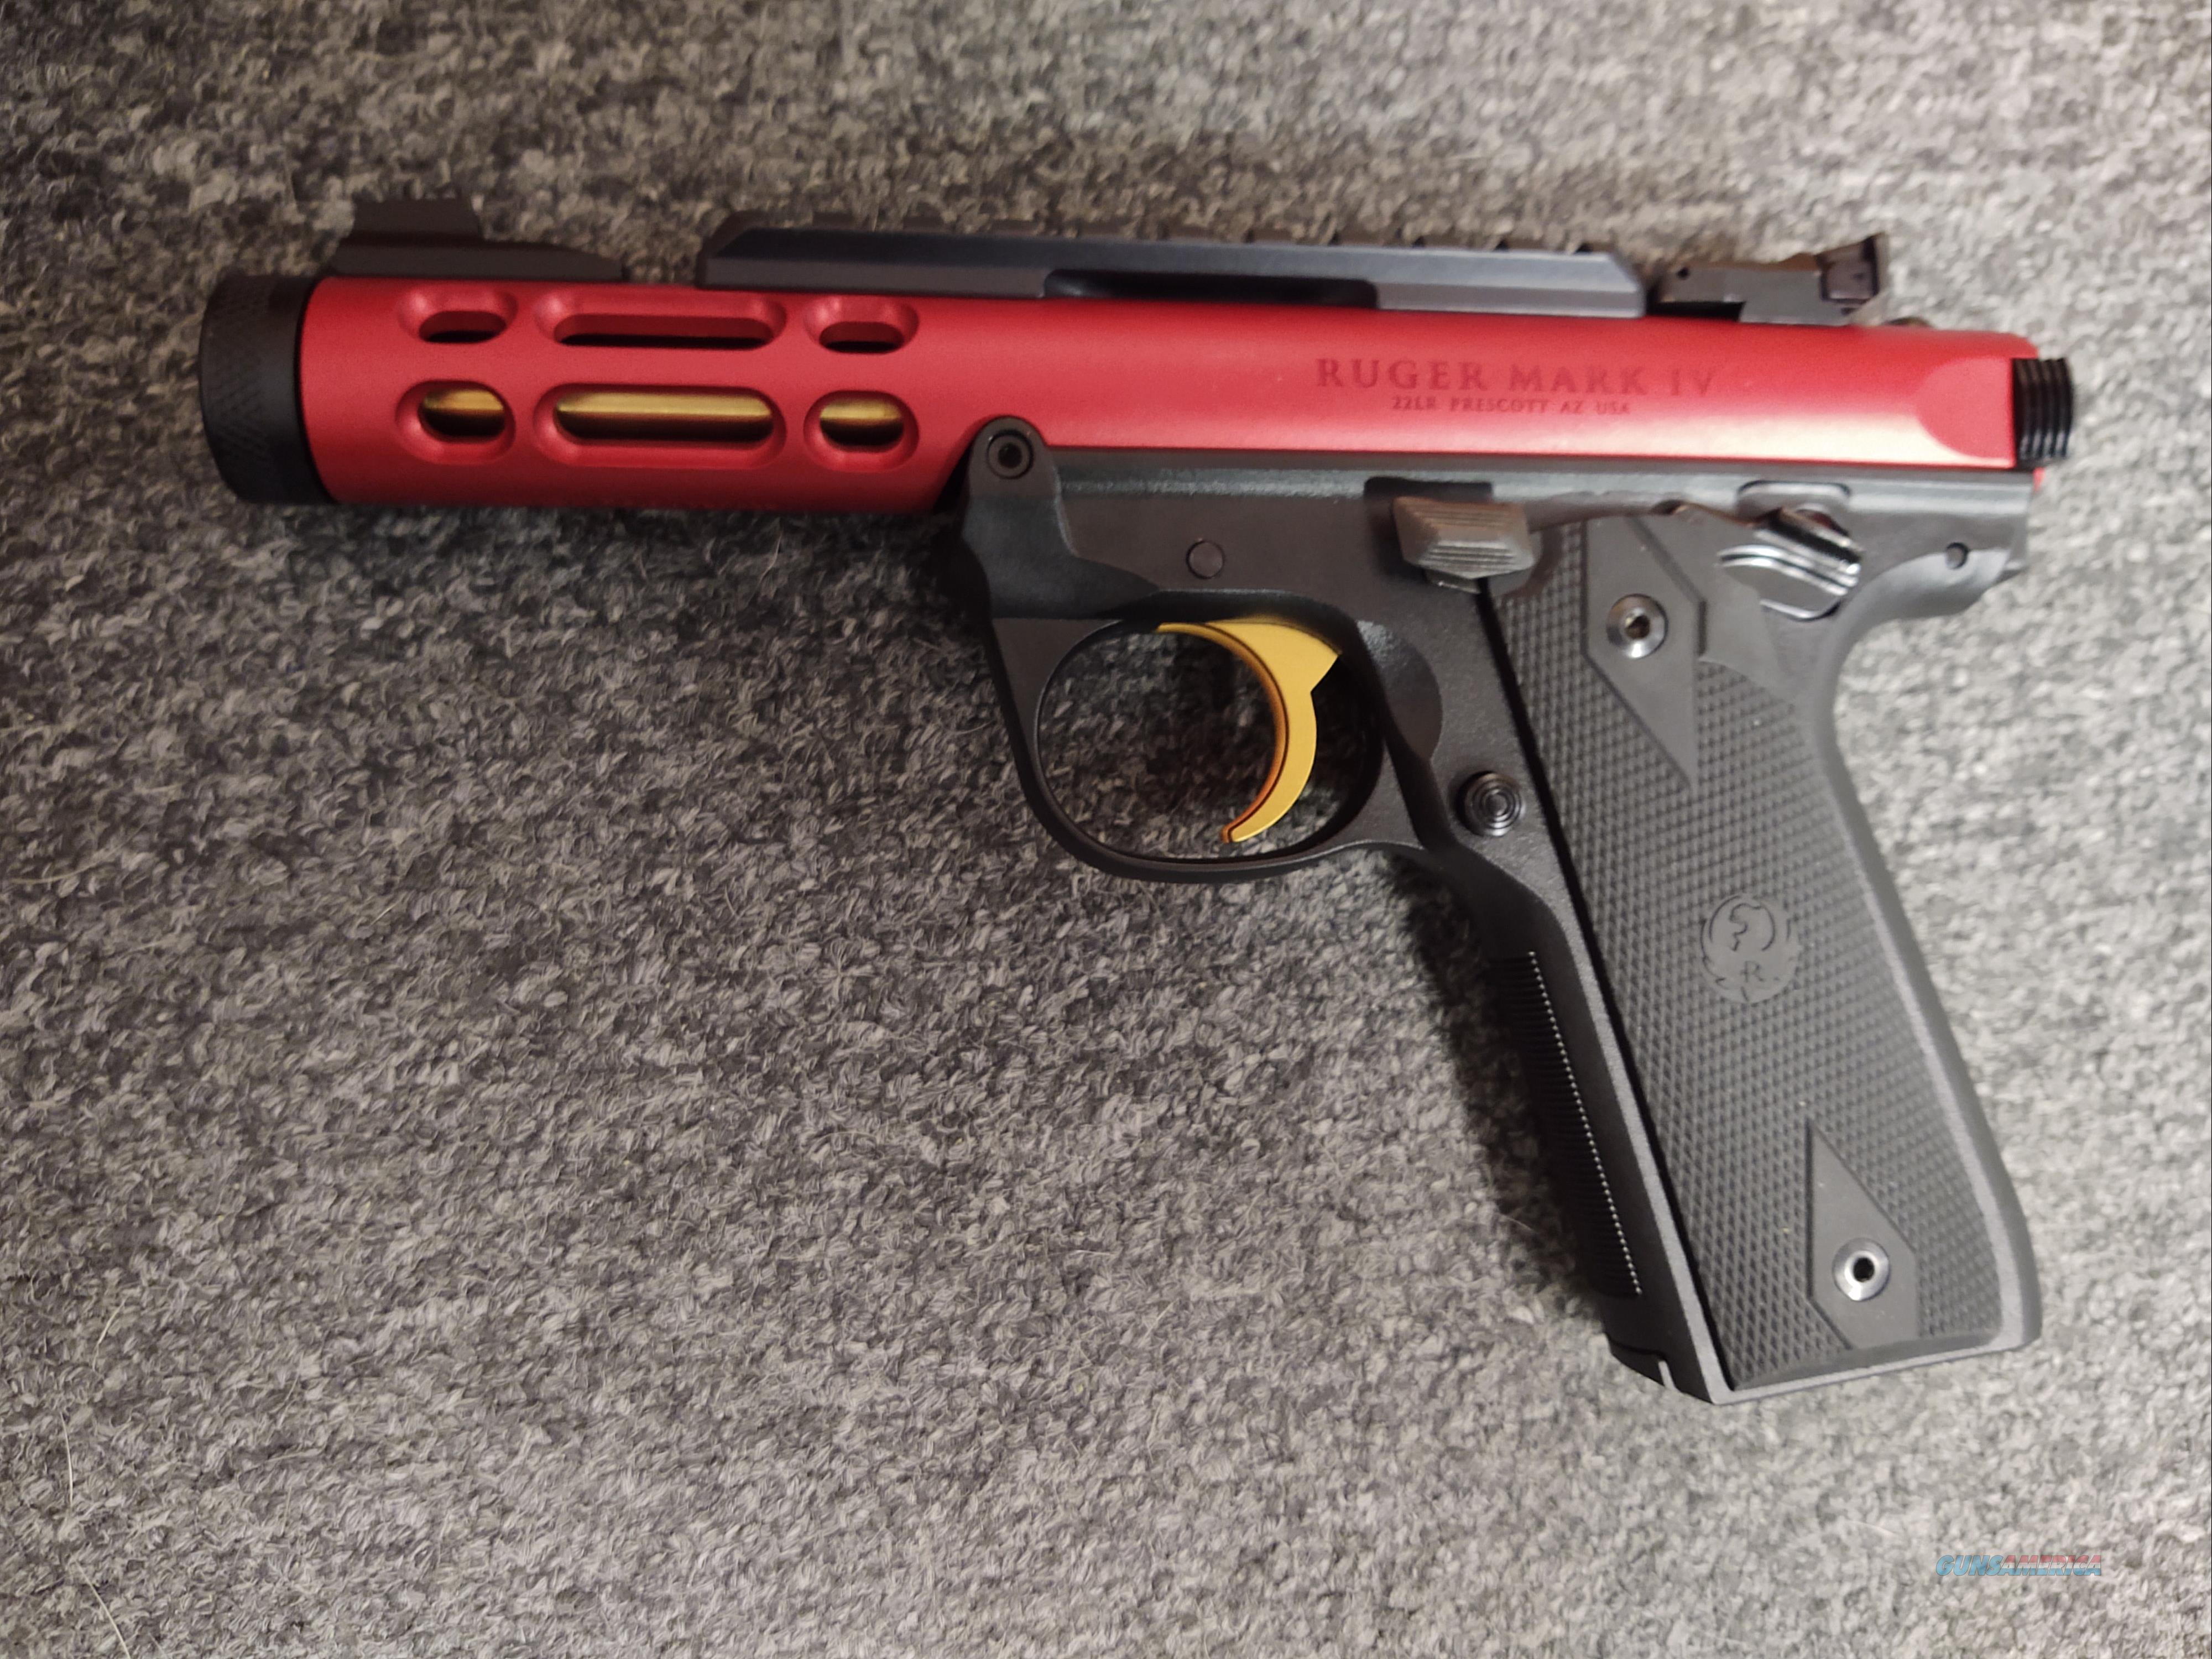 Mark IV 22/45 Lite (.22lr, red & black)  Guns > Pistols > Ruger Semi-Auto Pistols > Mark I/II/III/IV Family